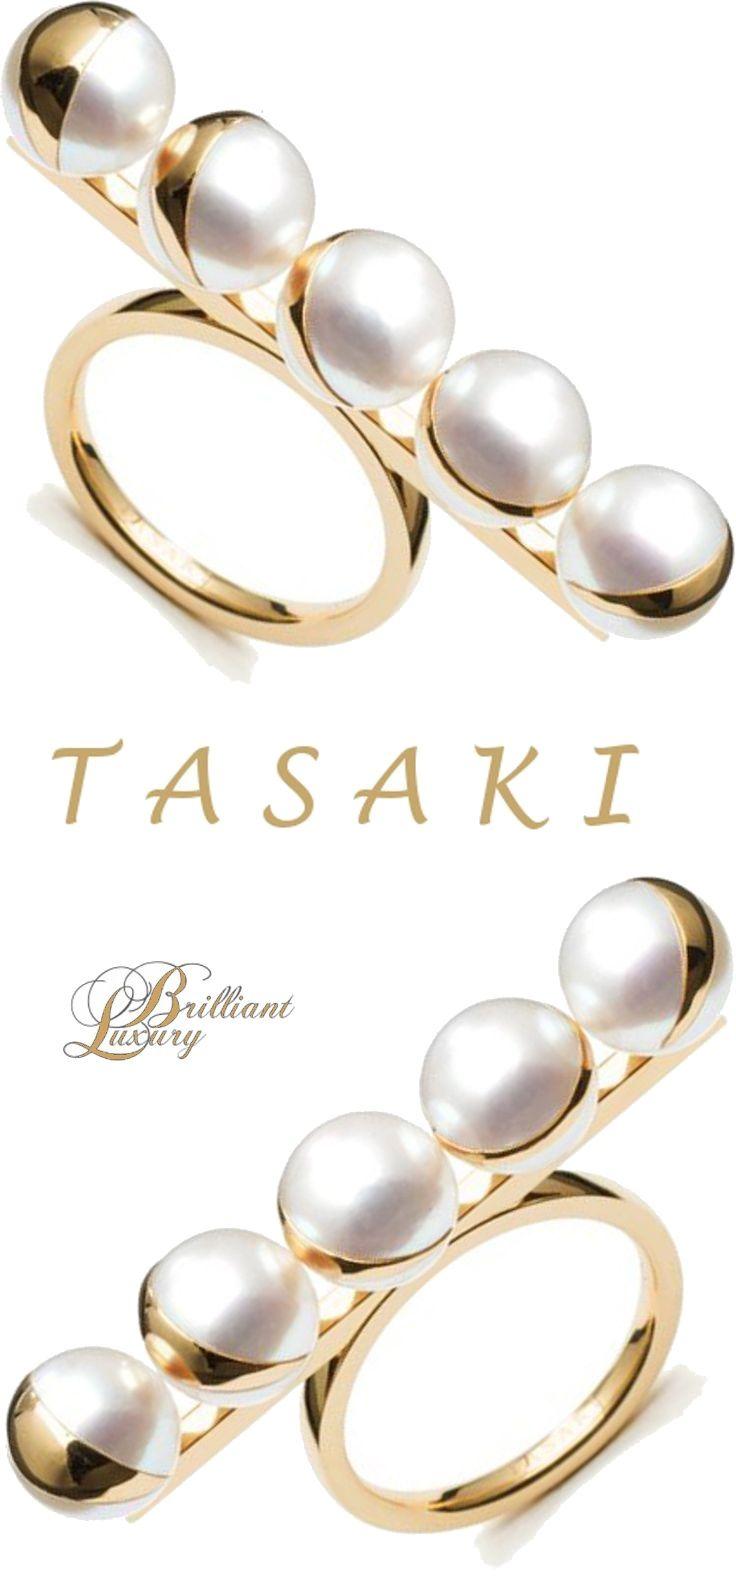 Brilliant Luxury * Balance Eclipse Ring // Tasaki